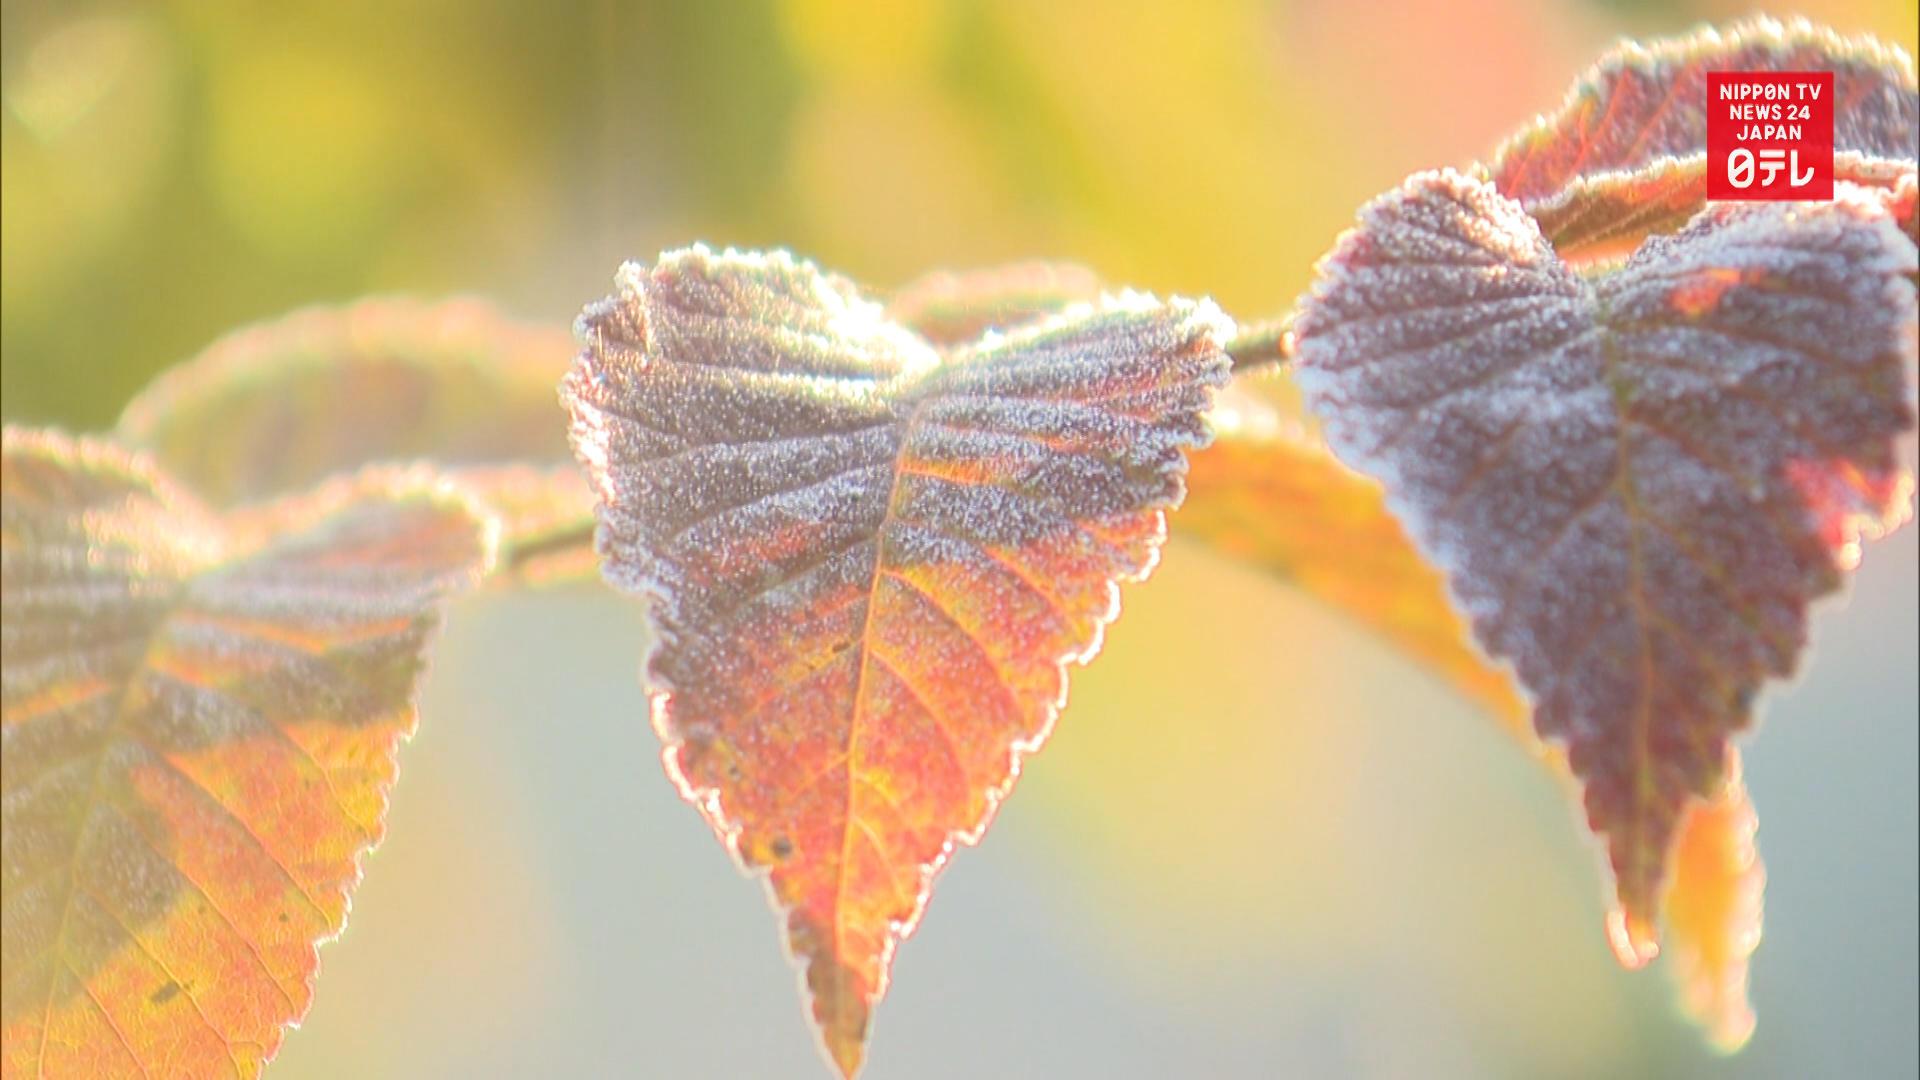 Subfreezing temperatures hit Hokkaido